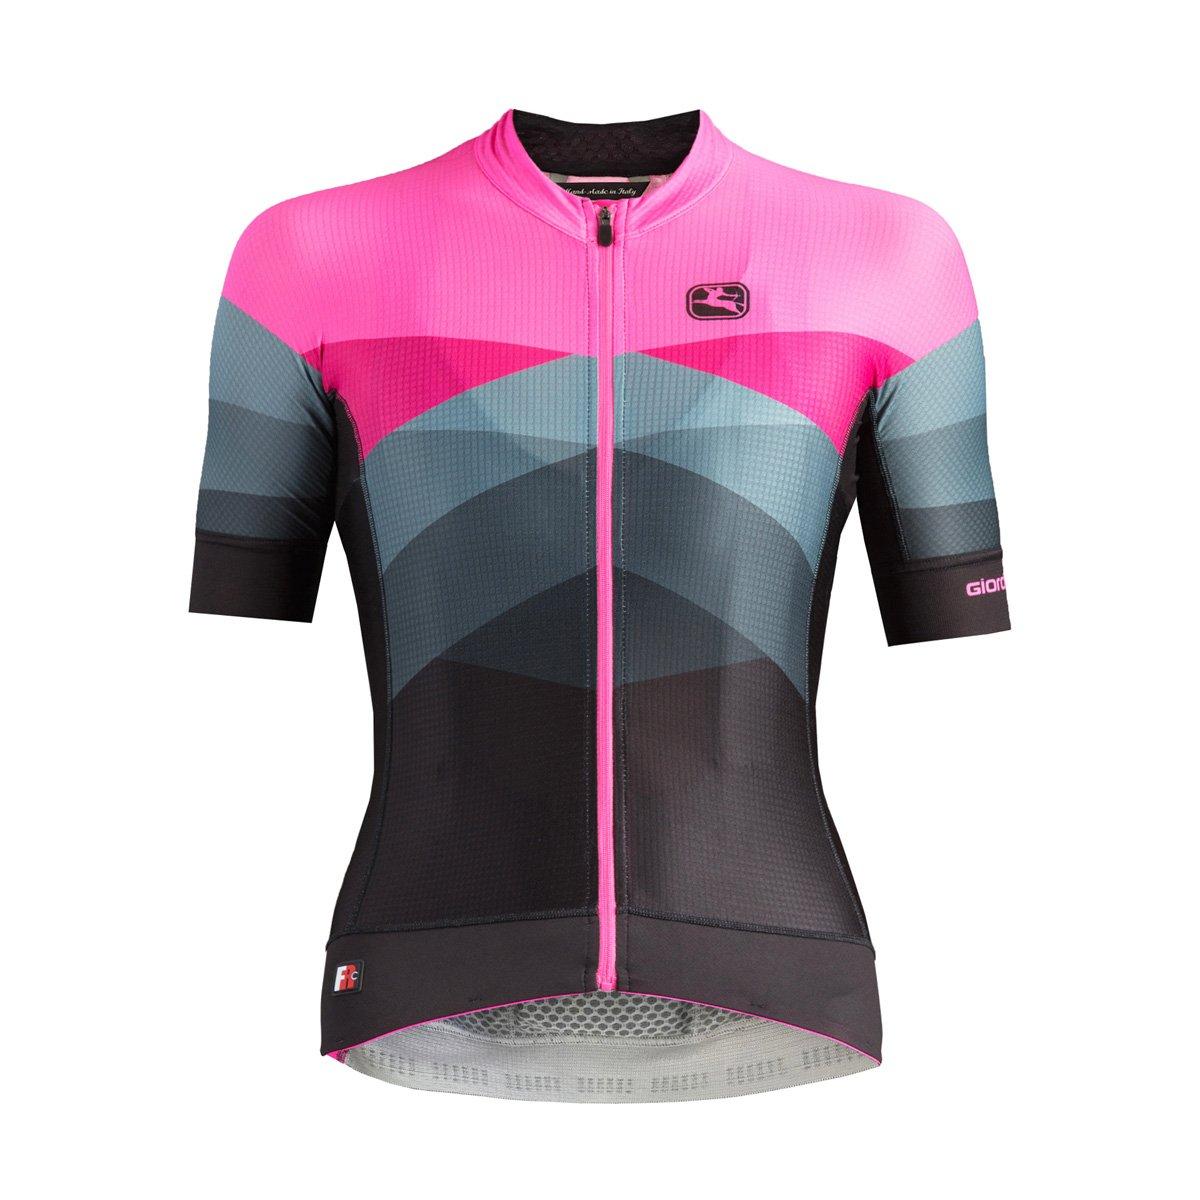 Giordana 2018 Women's Dolomiti FR-C Pro Moda Short Sleeve Cycling Jersey - GICS18-WSSJ-FRCP-DO (DOLOMITI-Pink/Black - 2XS)